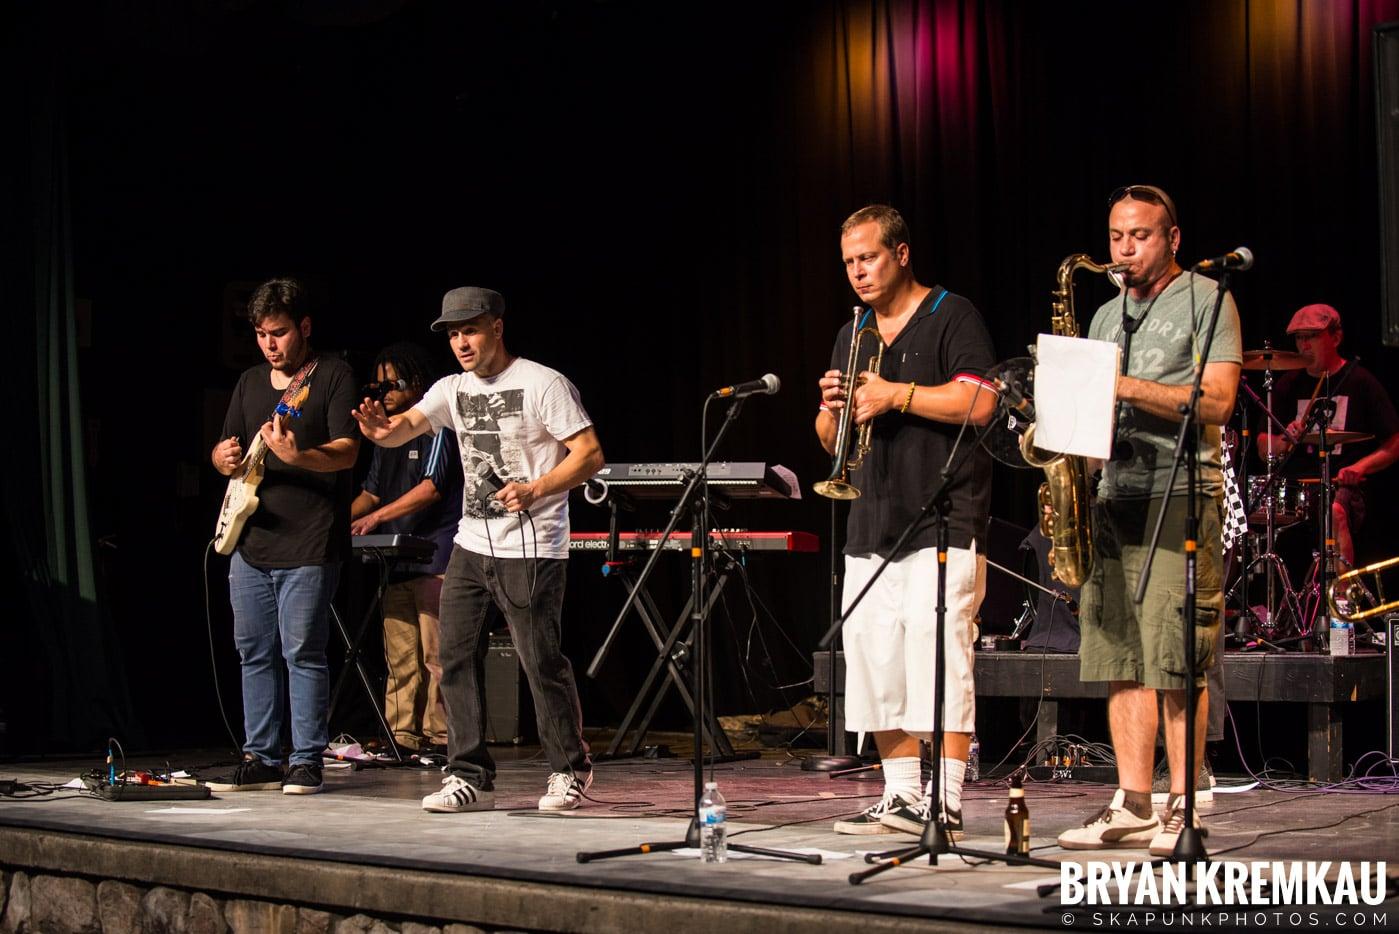 The Rudie Crew @ Oskar Schindler Performing Arts Center, West Orange, NJ - 8.19.17 (6)